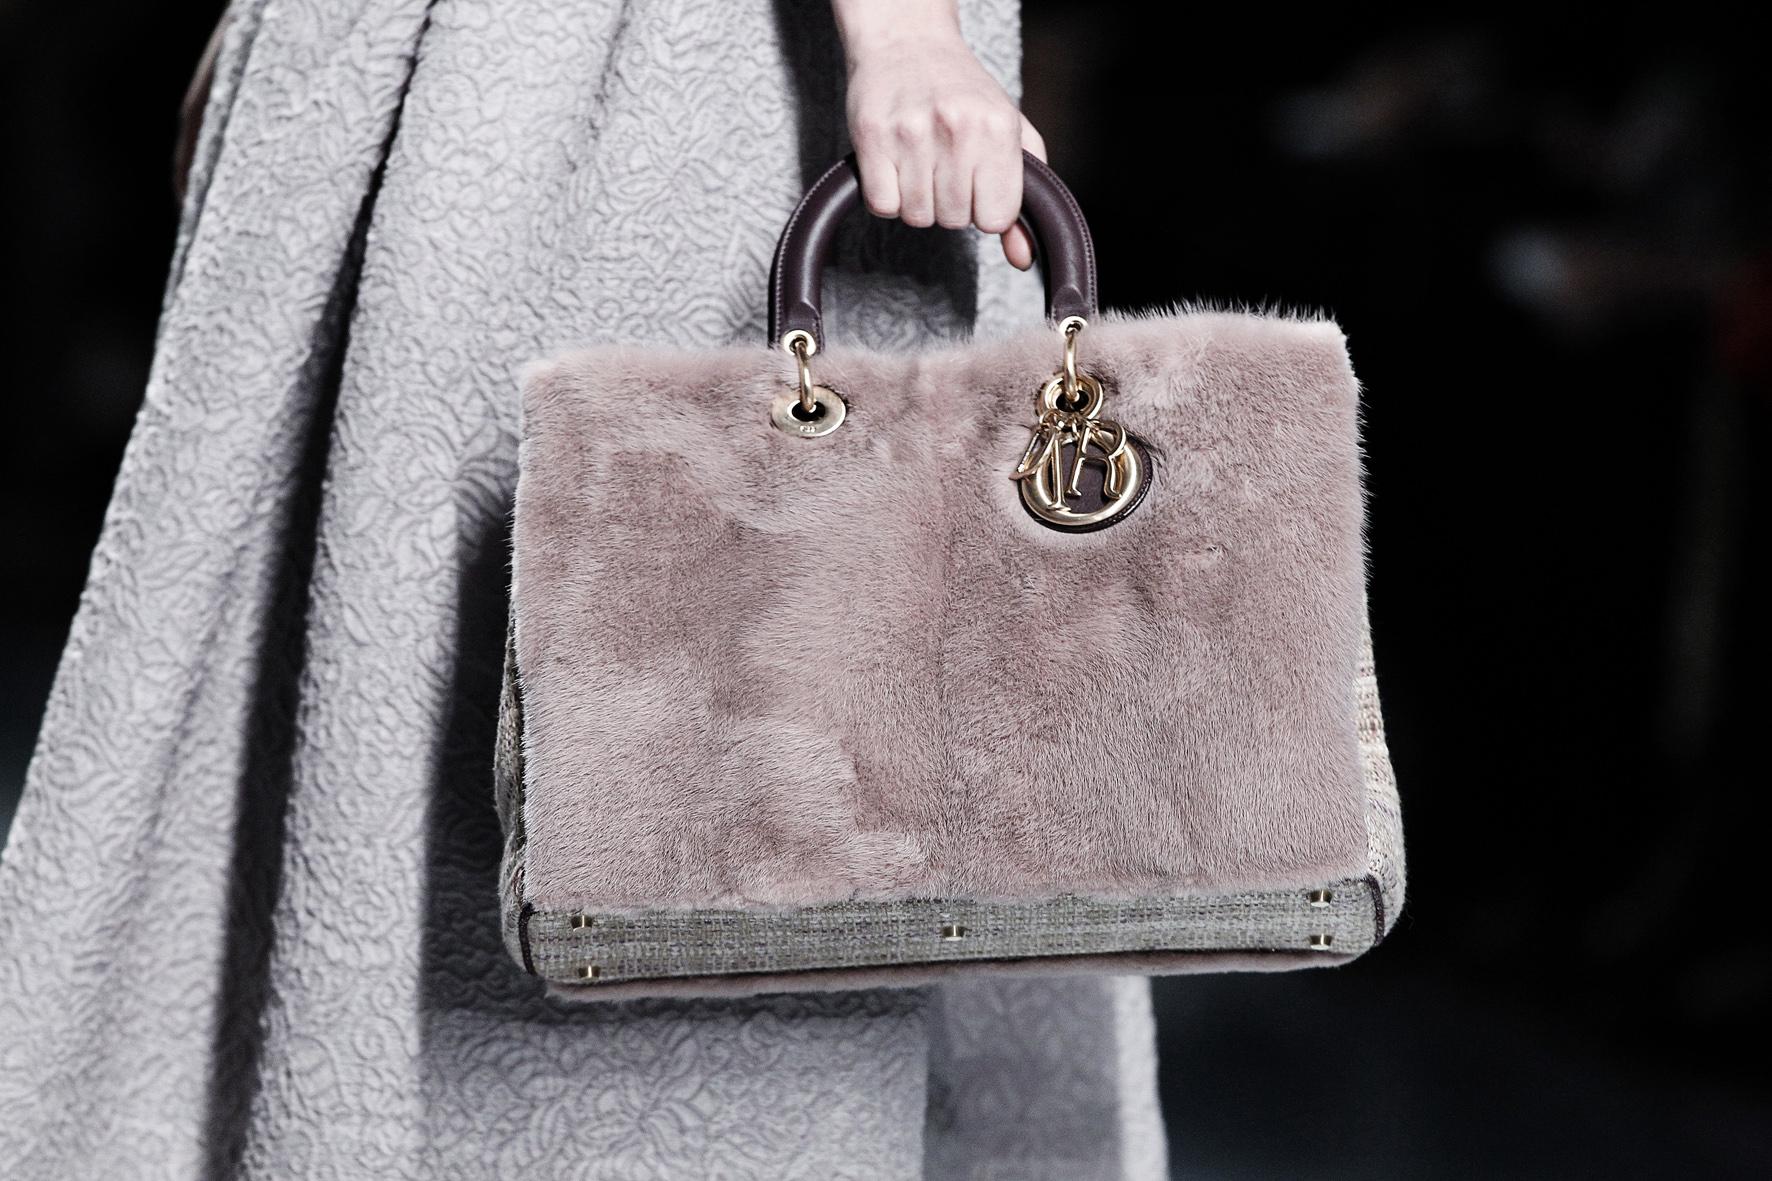 Меховая сумка от Christian Dior